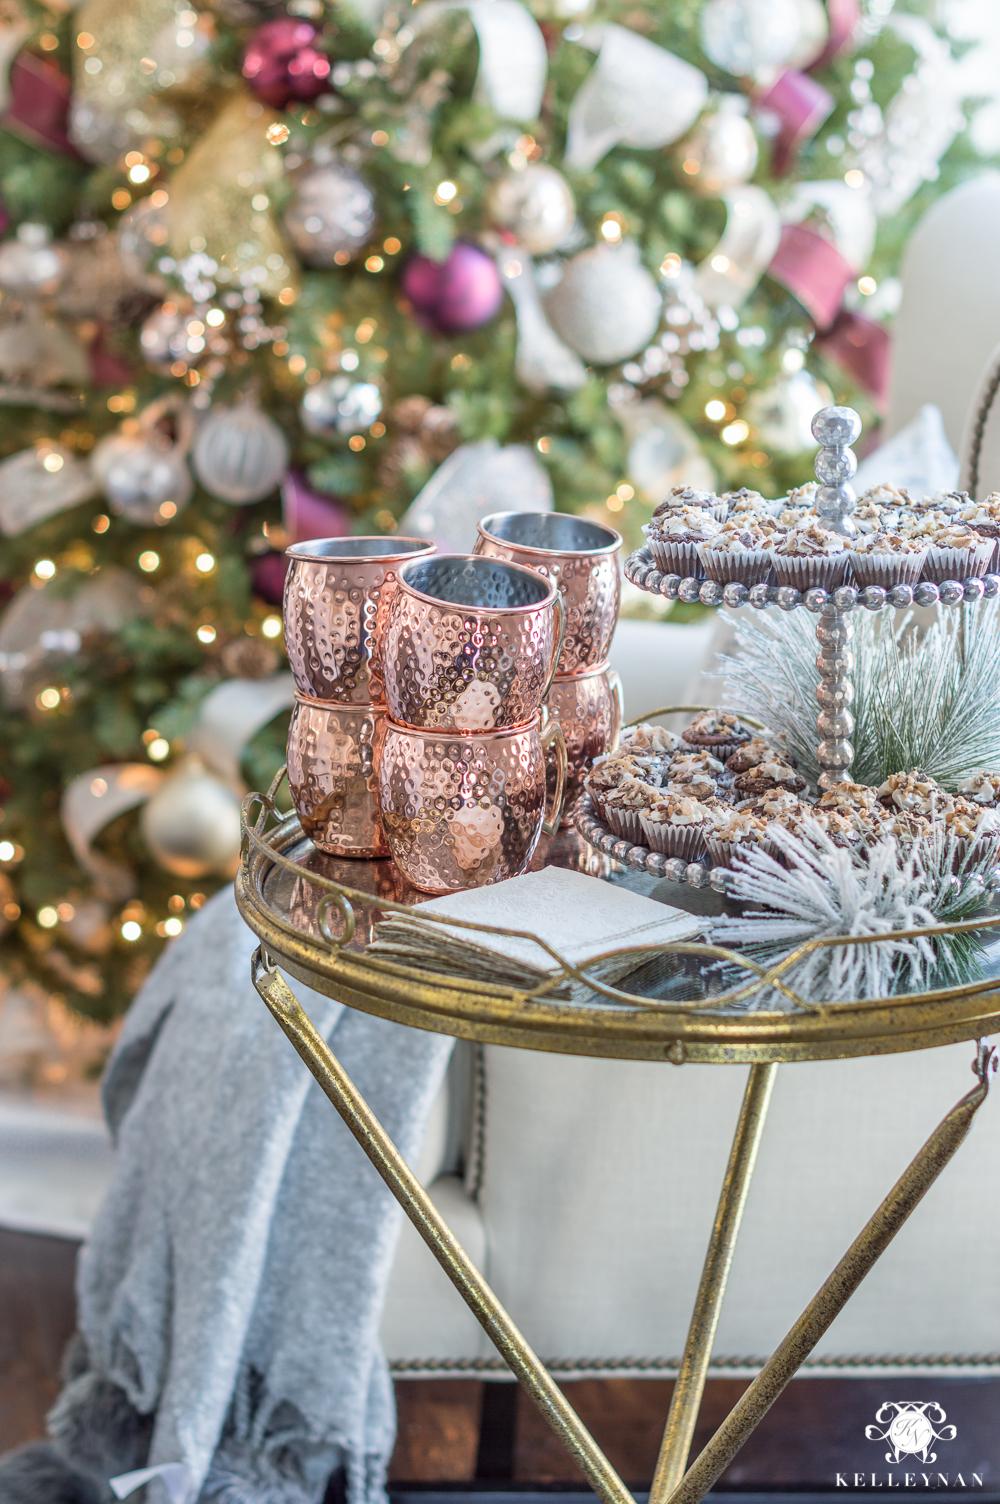 Christmas dessert display for after dinner